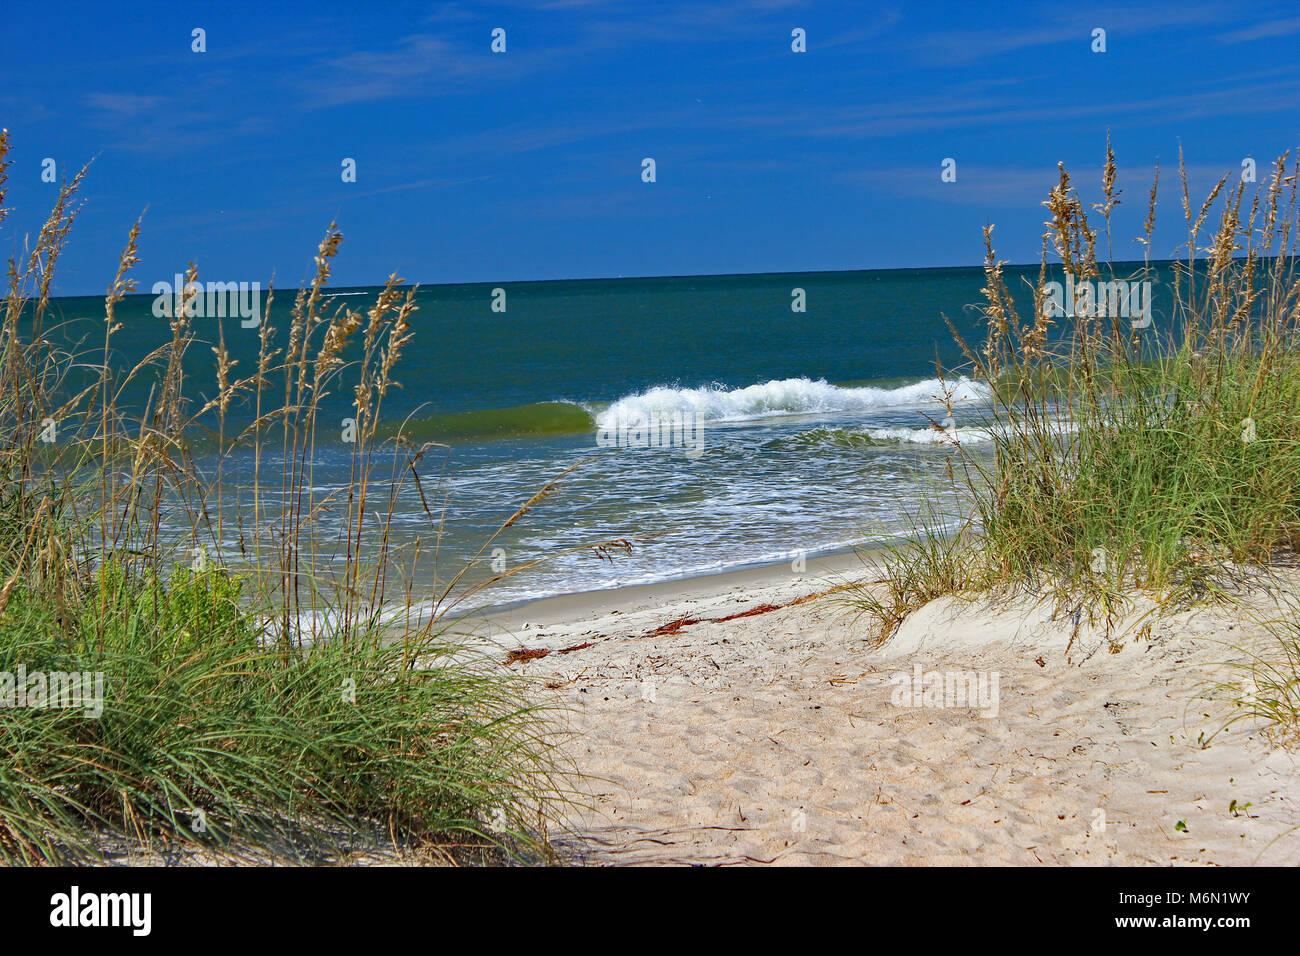 oak island north carolina beach stock photo 176254119 alamy